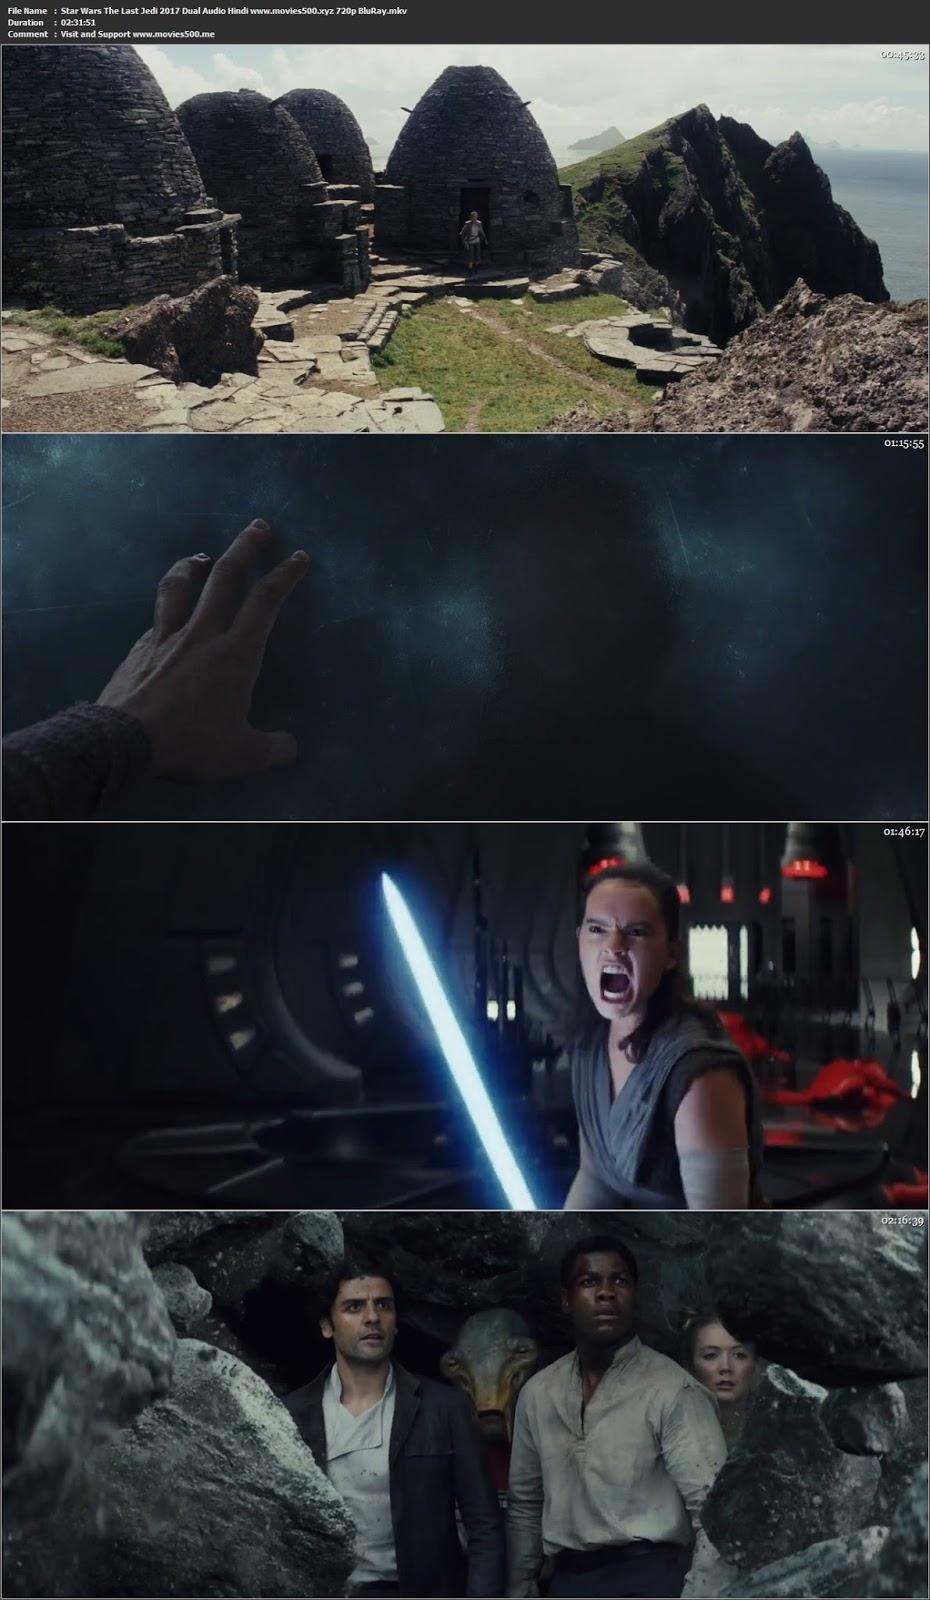 Star Wars The Last Jedi 2017 Dual Audio Hindi BluyRay 720p 1GB at movies500.xyz